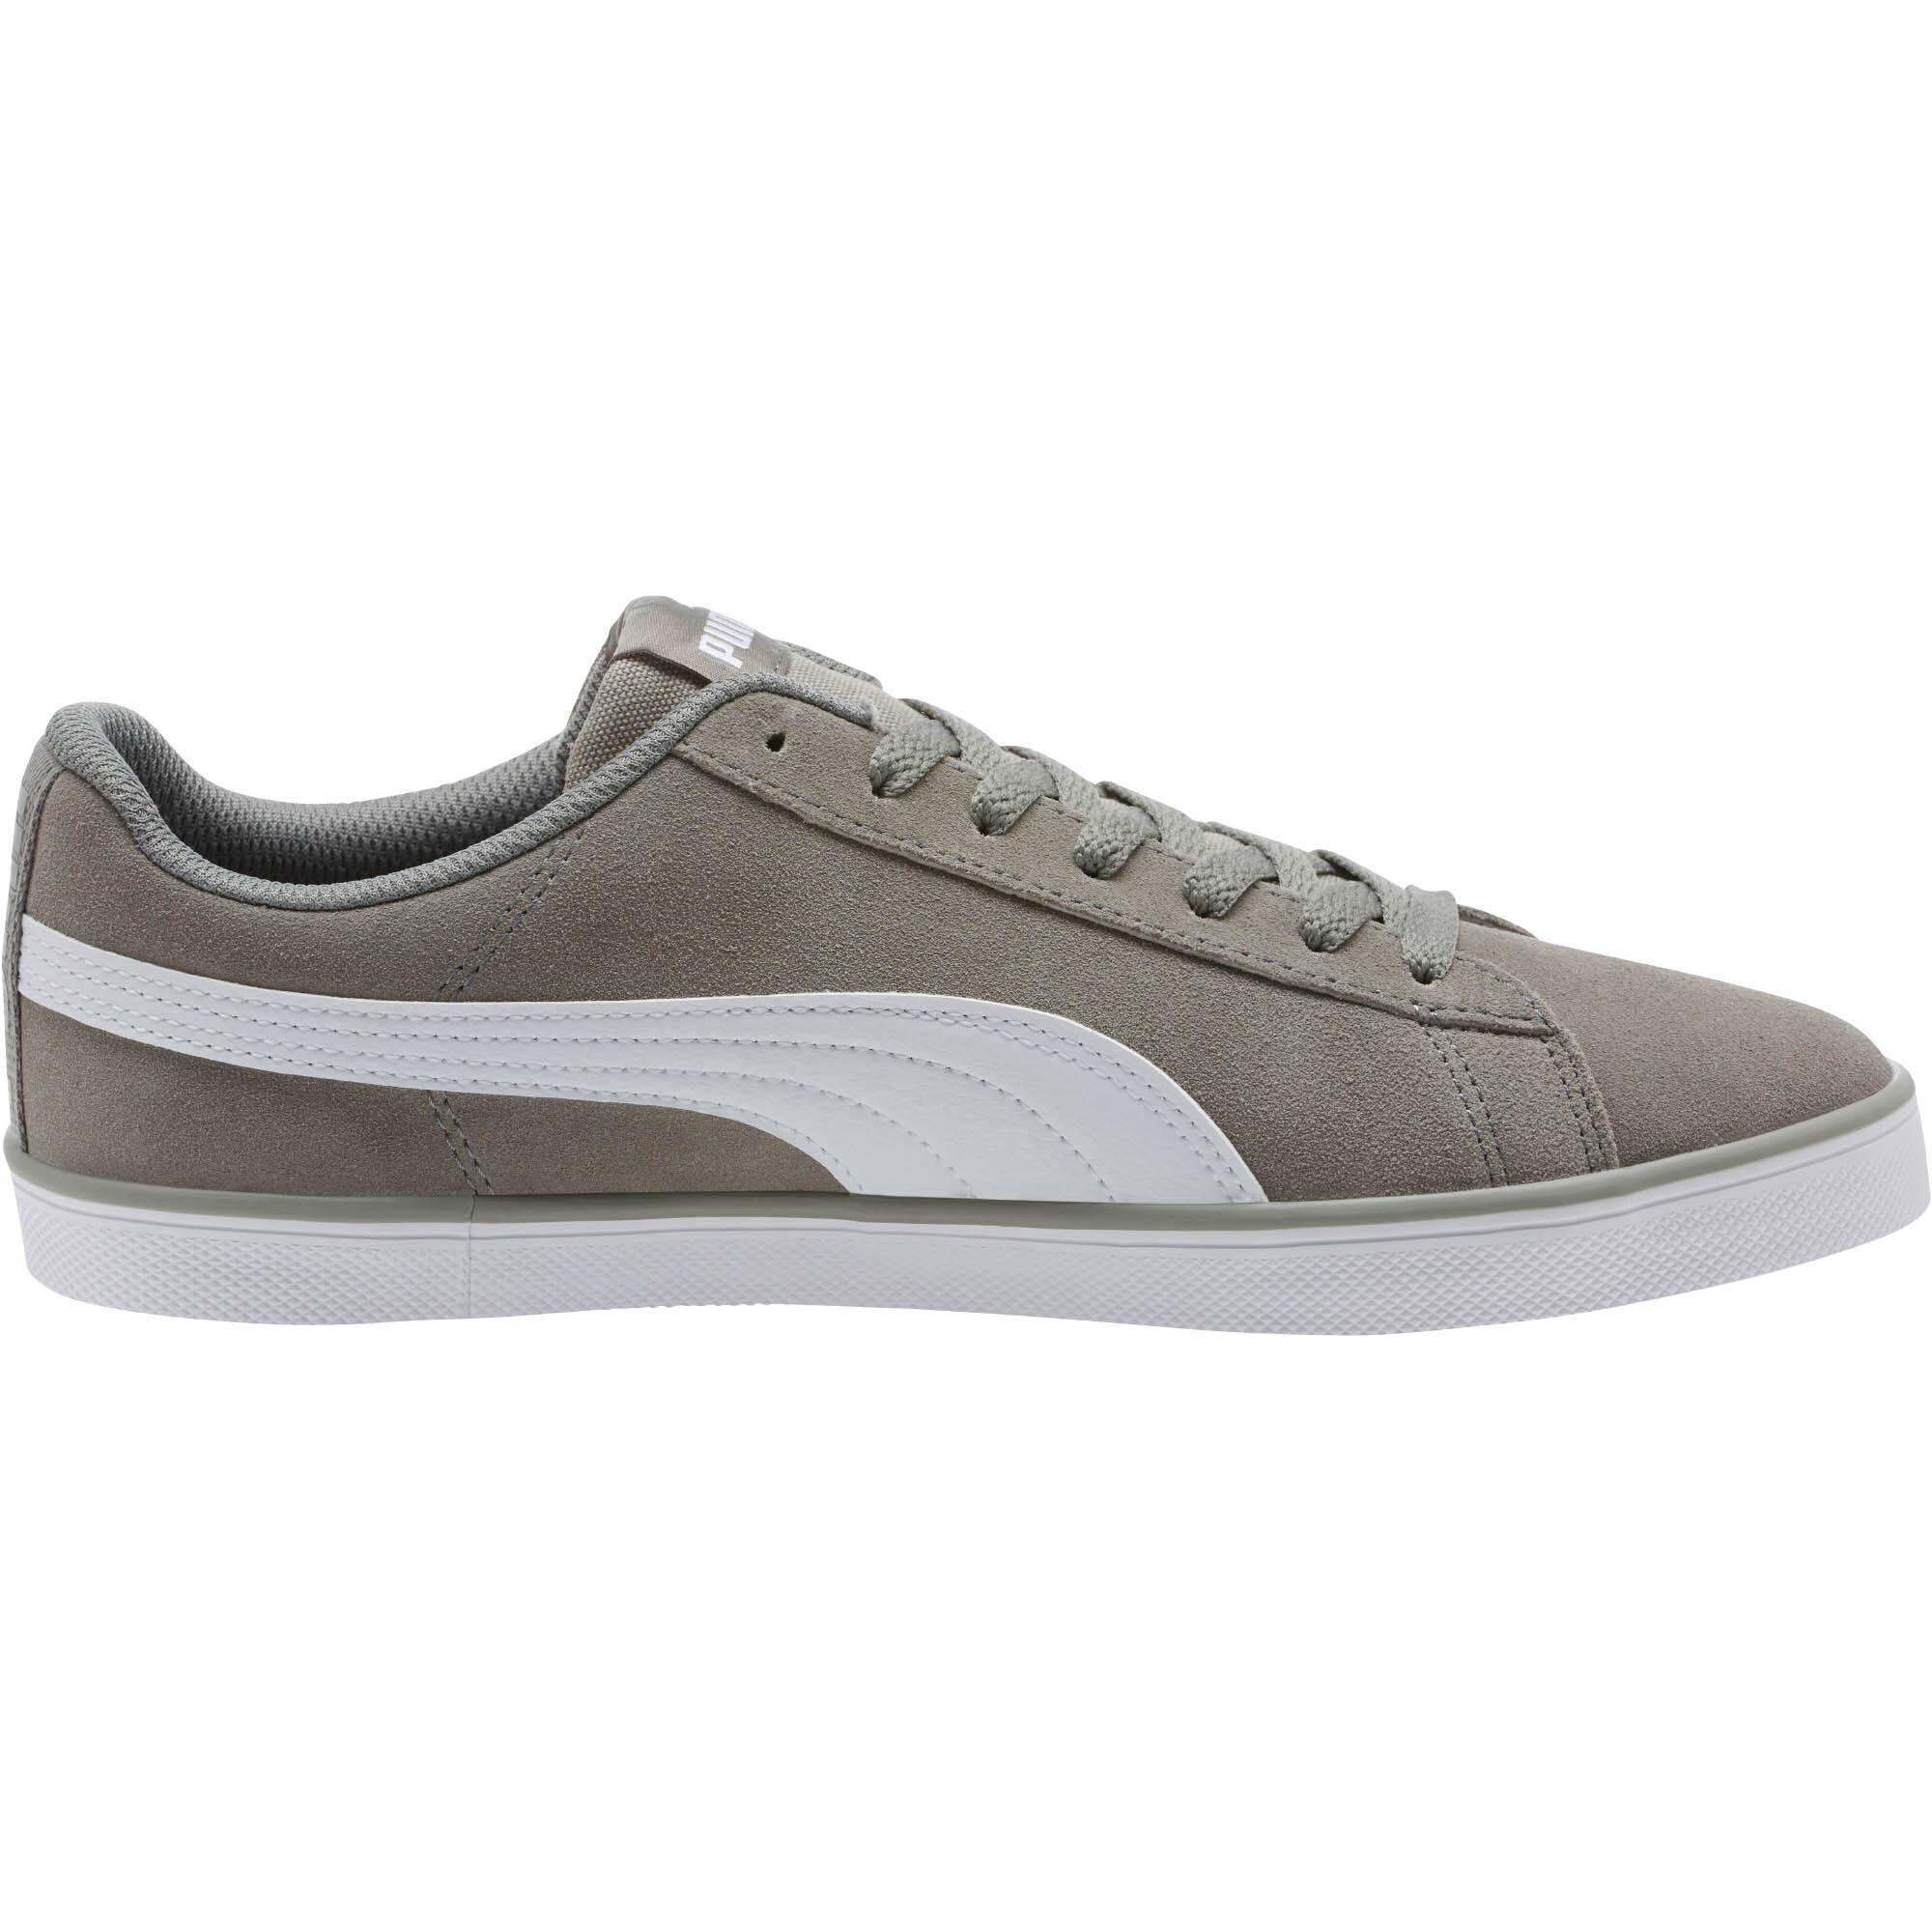 PUMA-Urban-Plus-Suede-Sneakers-Men-Shoe-Basics thumbnail 14